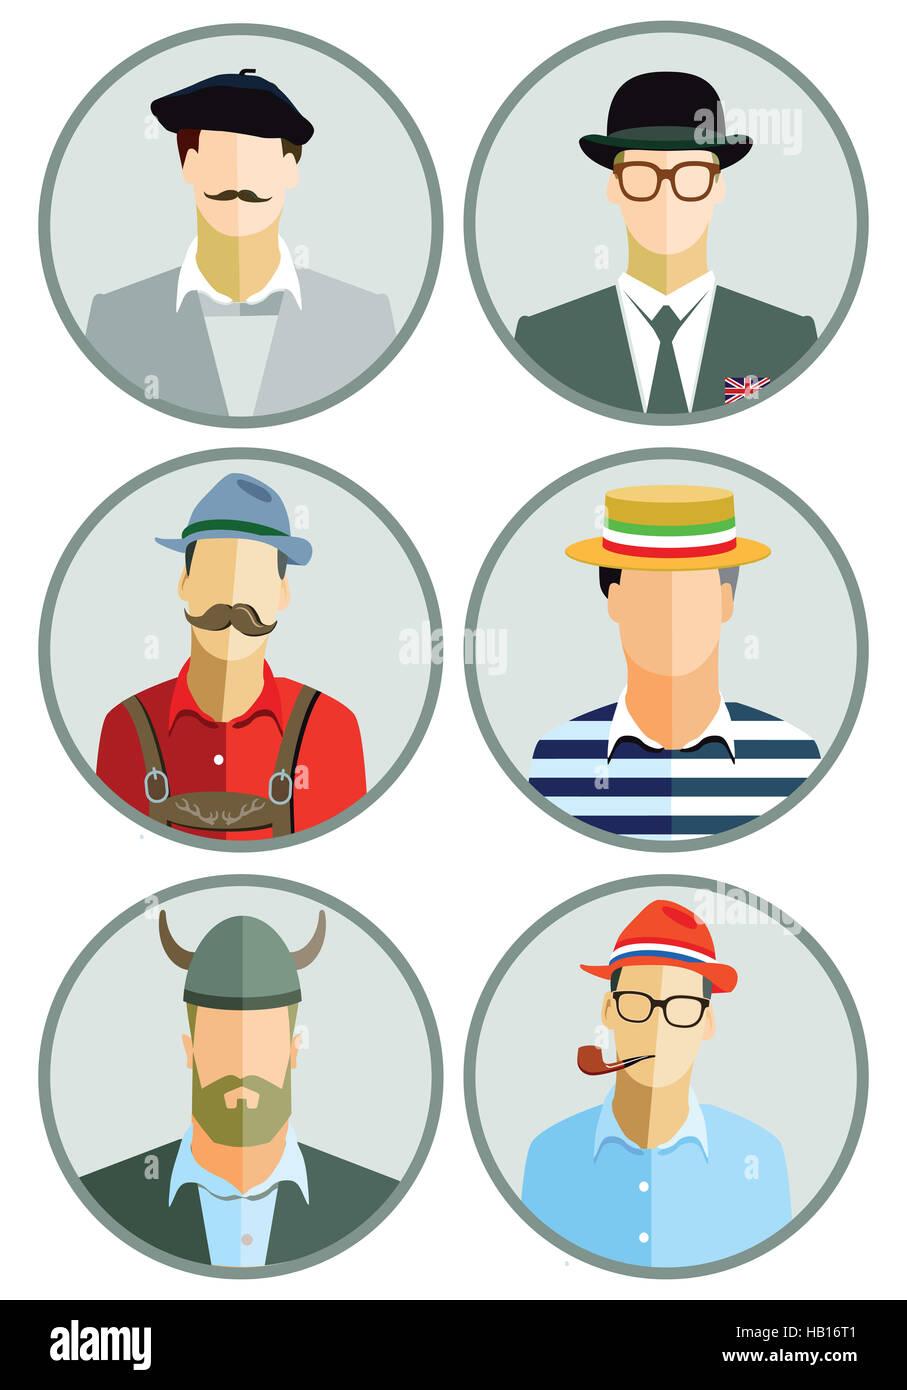 European Men - Stock Image